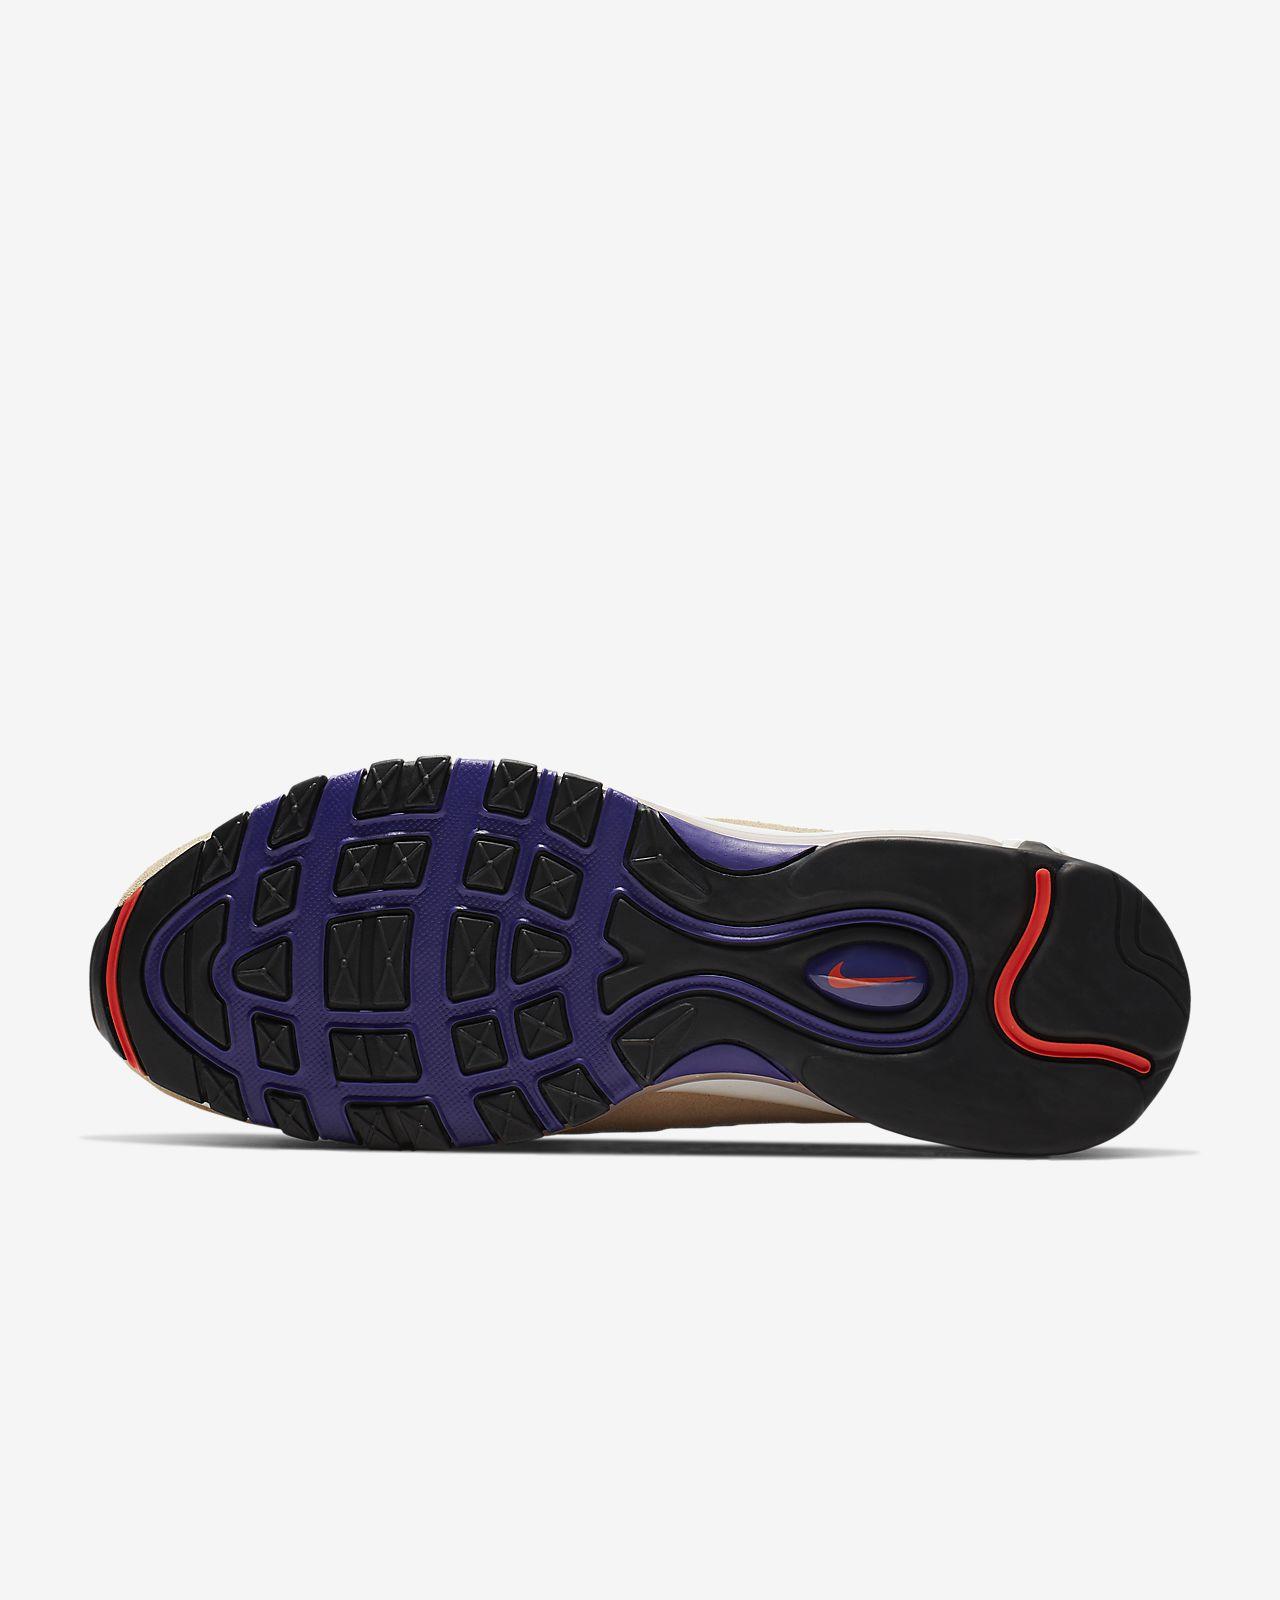 80caa67600a Nike Air Max 98 Men's Shoe. Nike.com NO